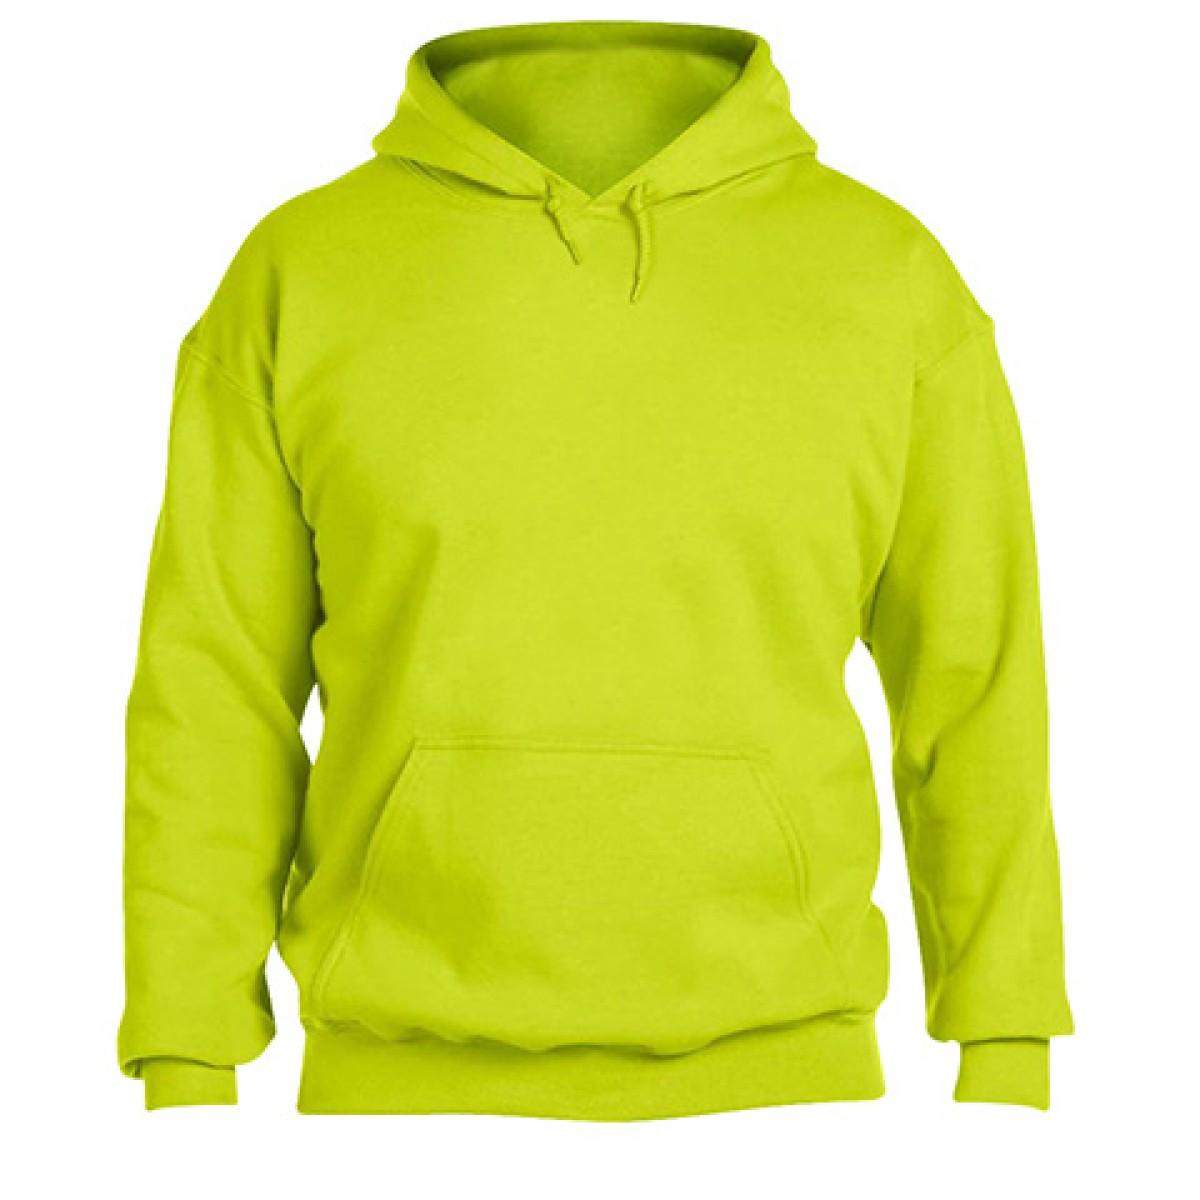 Solid Hooded Sweatshirt  50/50 Heavy Blend-Neon Green-XL